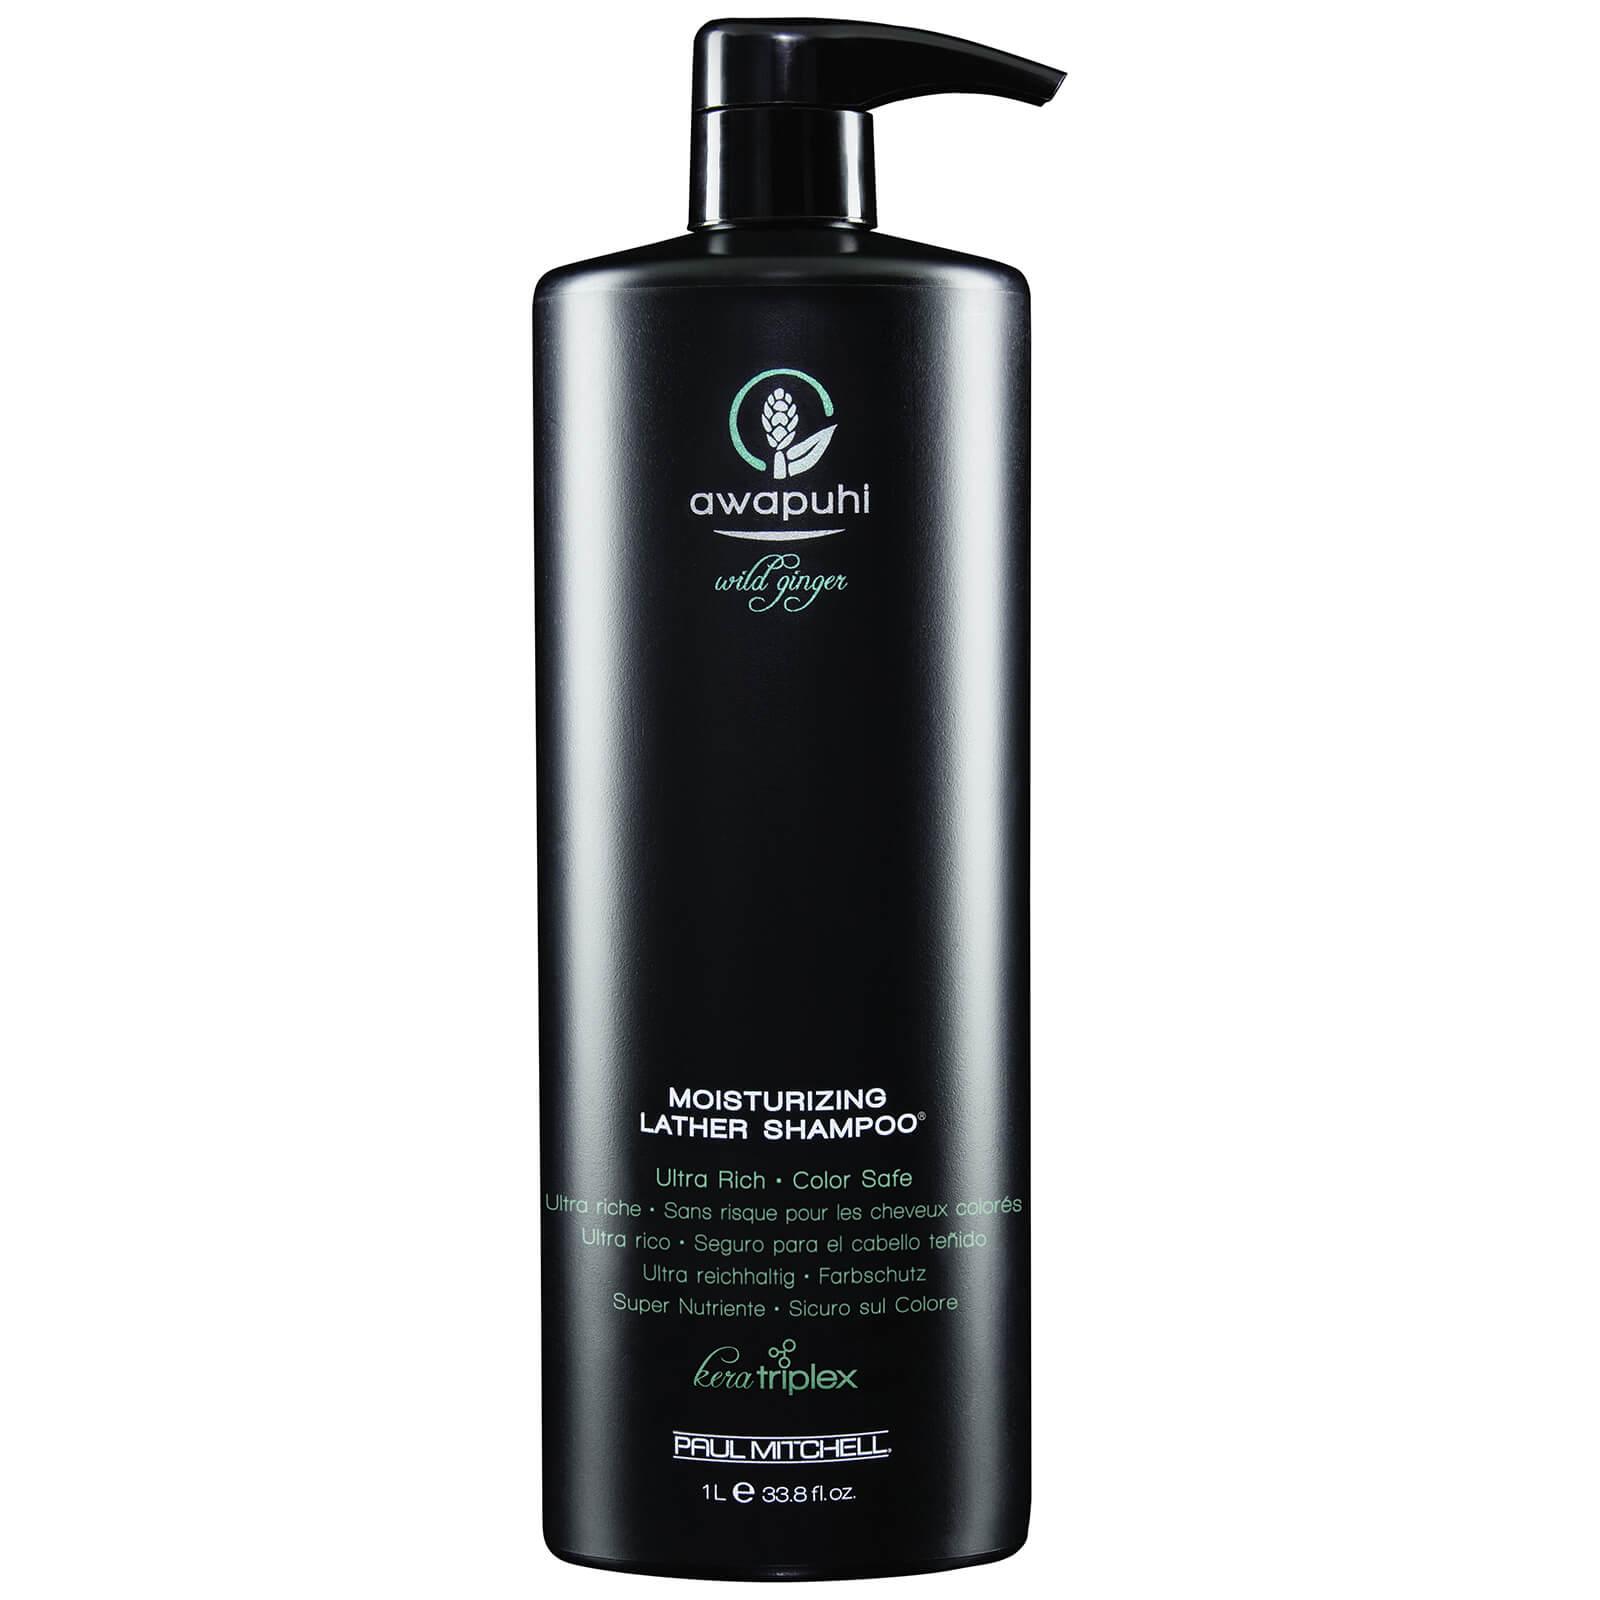 Paul Mitchell Awapuhi Wild Ginger Moisturizing Lather Shampoo 1000ml